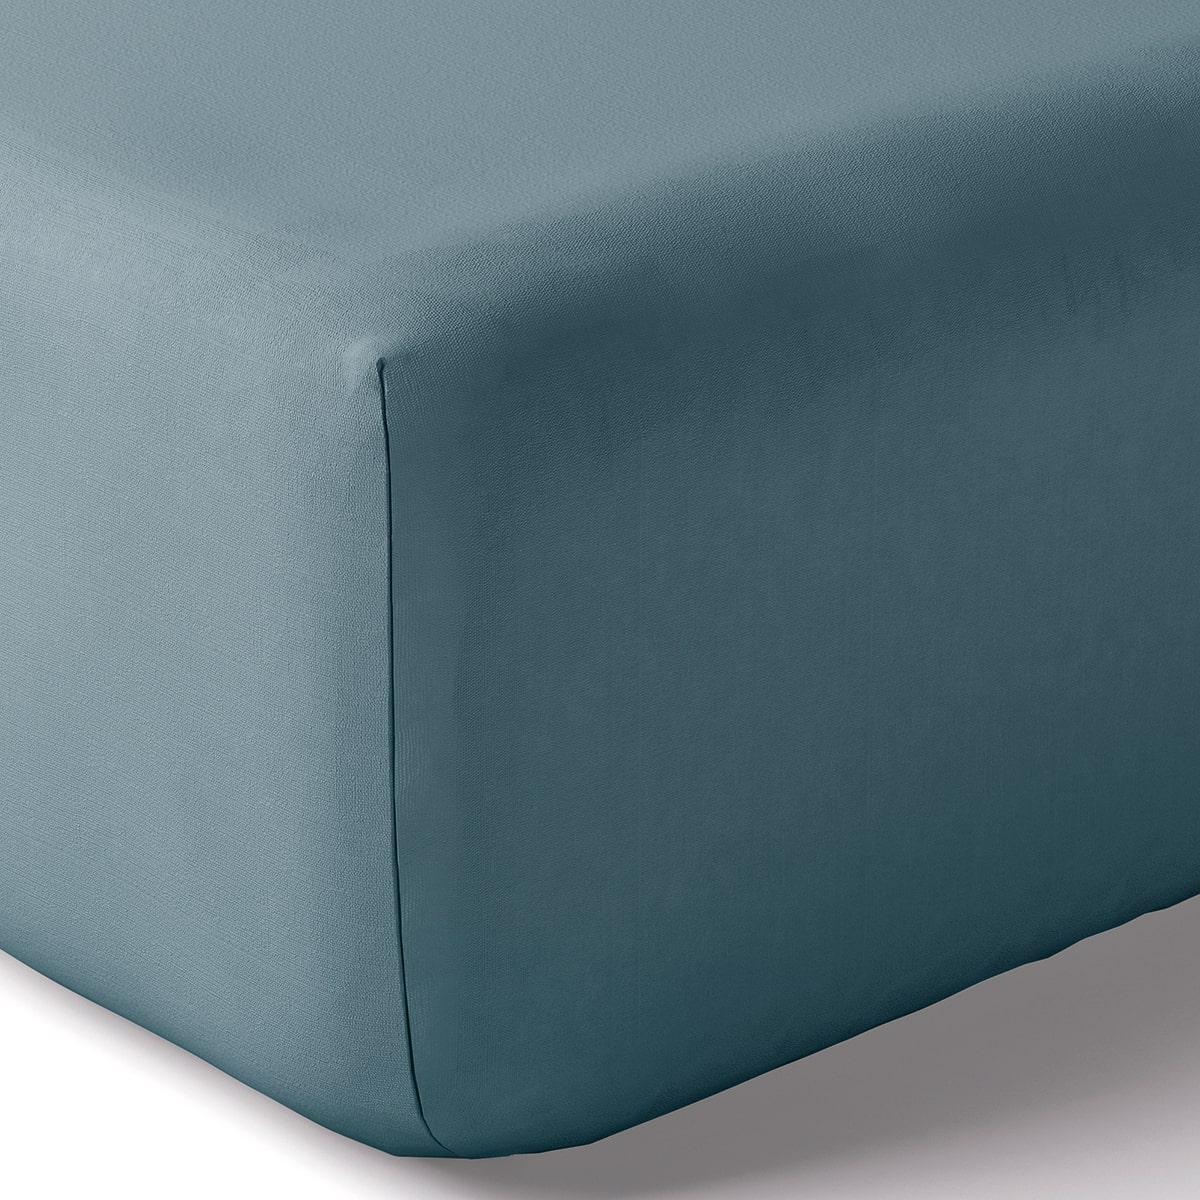 Drap housse coton 120x190 cm orage